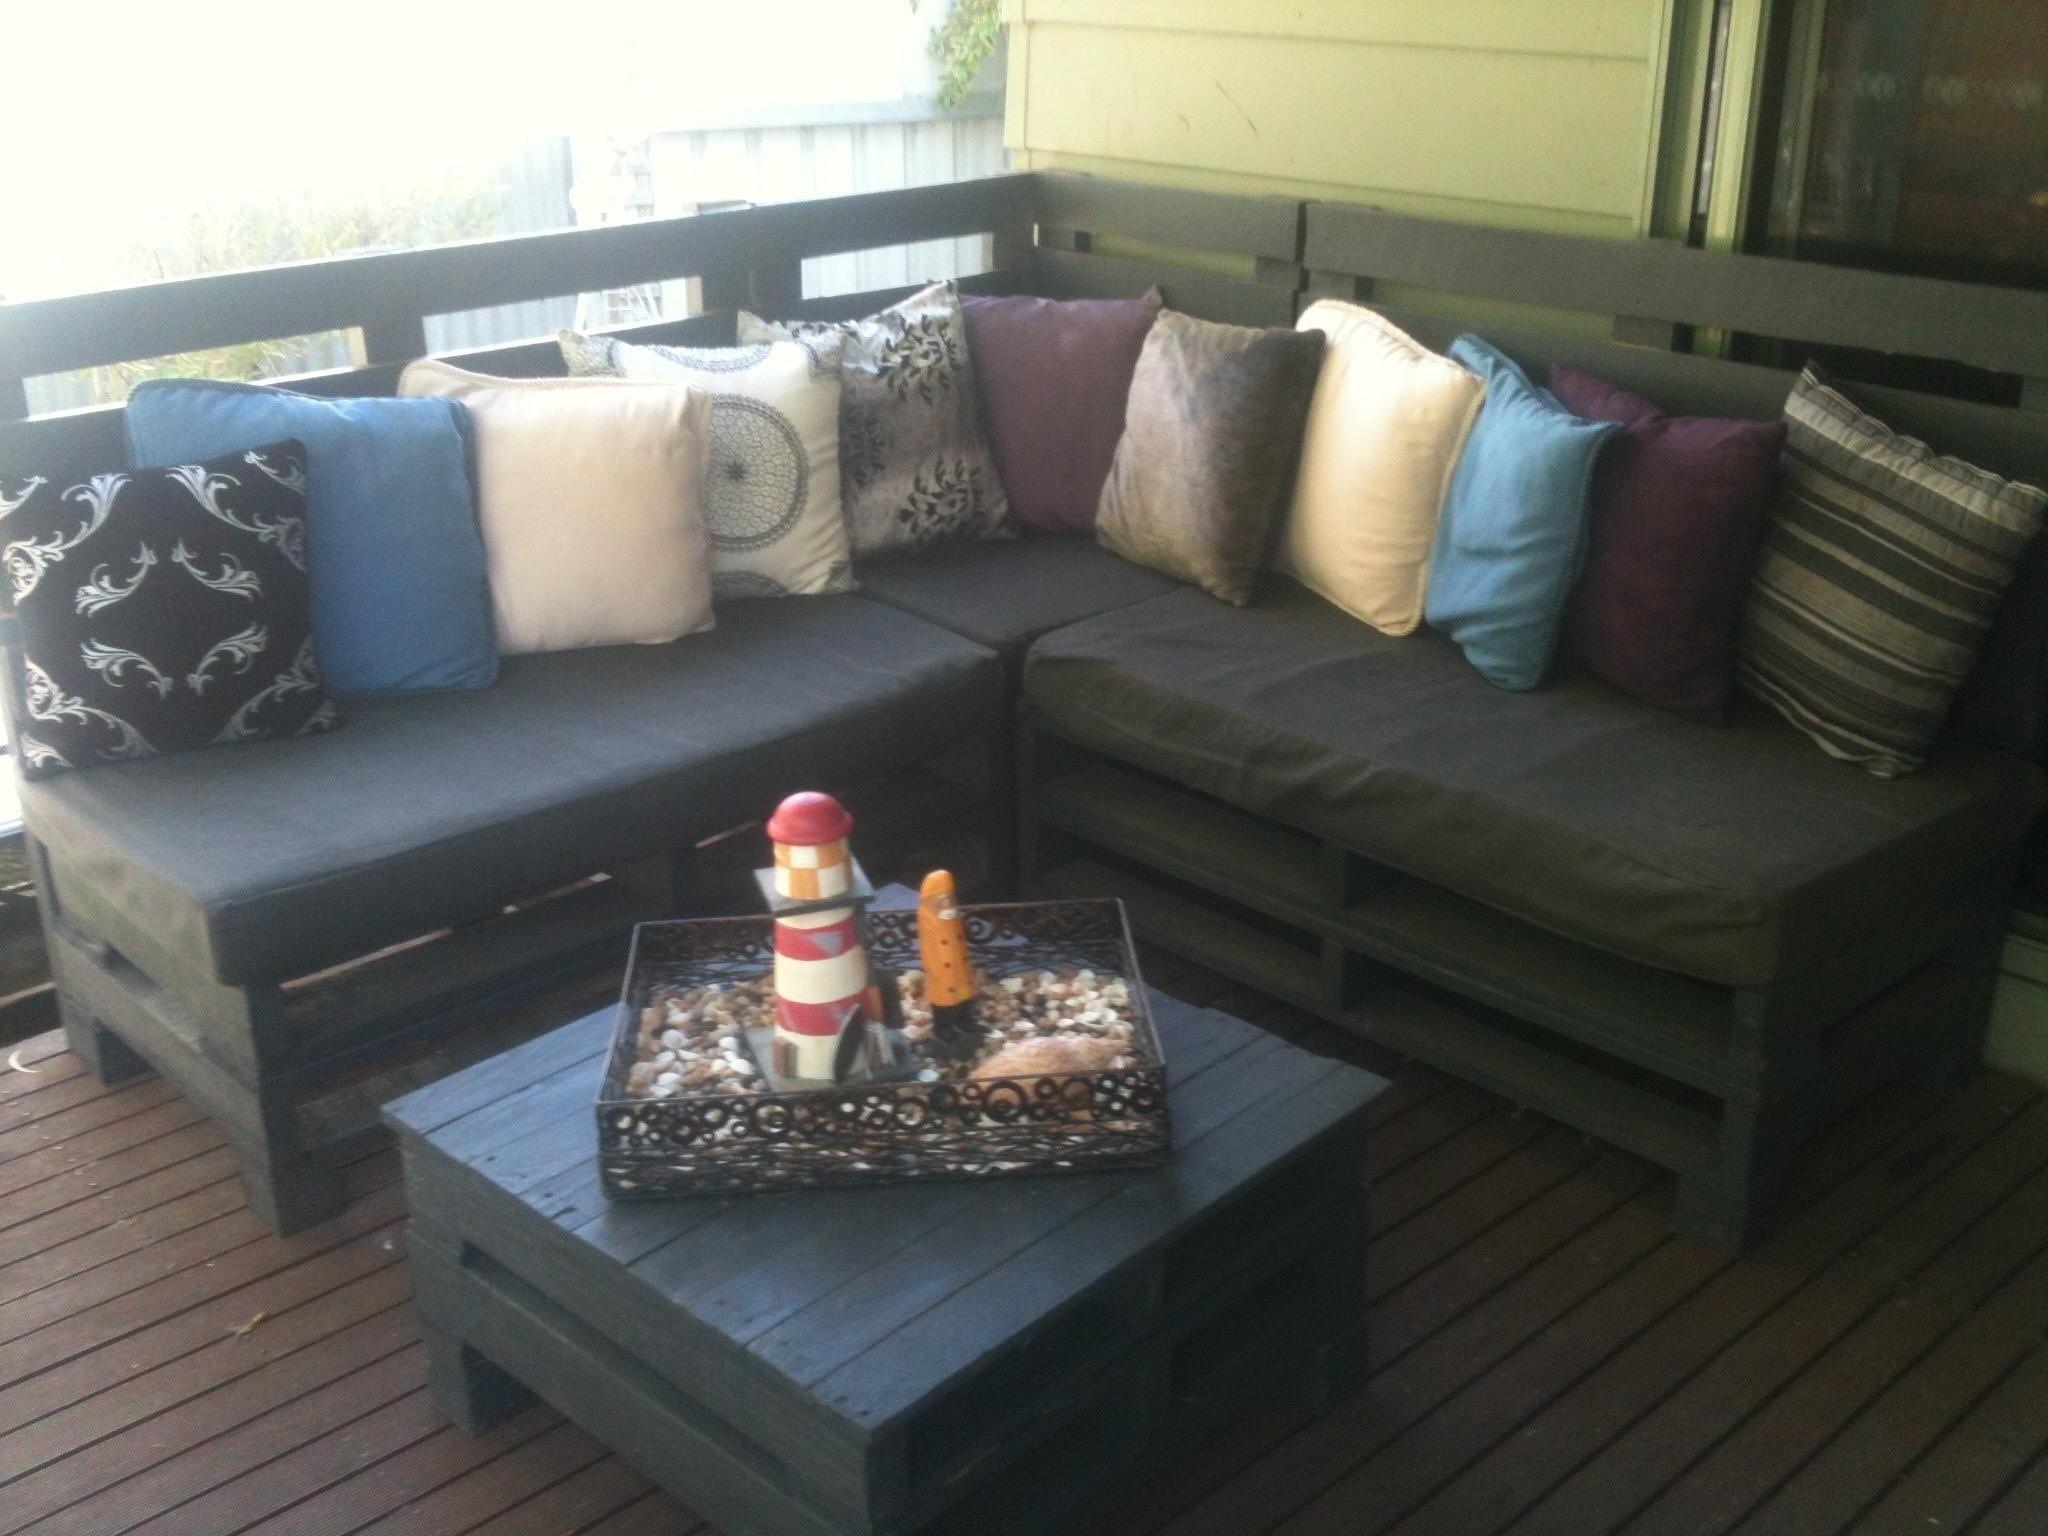 Backyard Retreat On This Pallets Sofa Pallet sofa Backyard